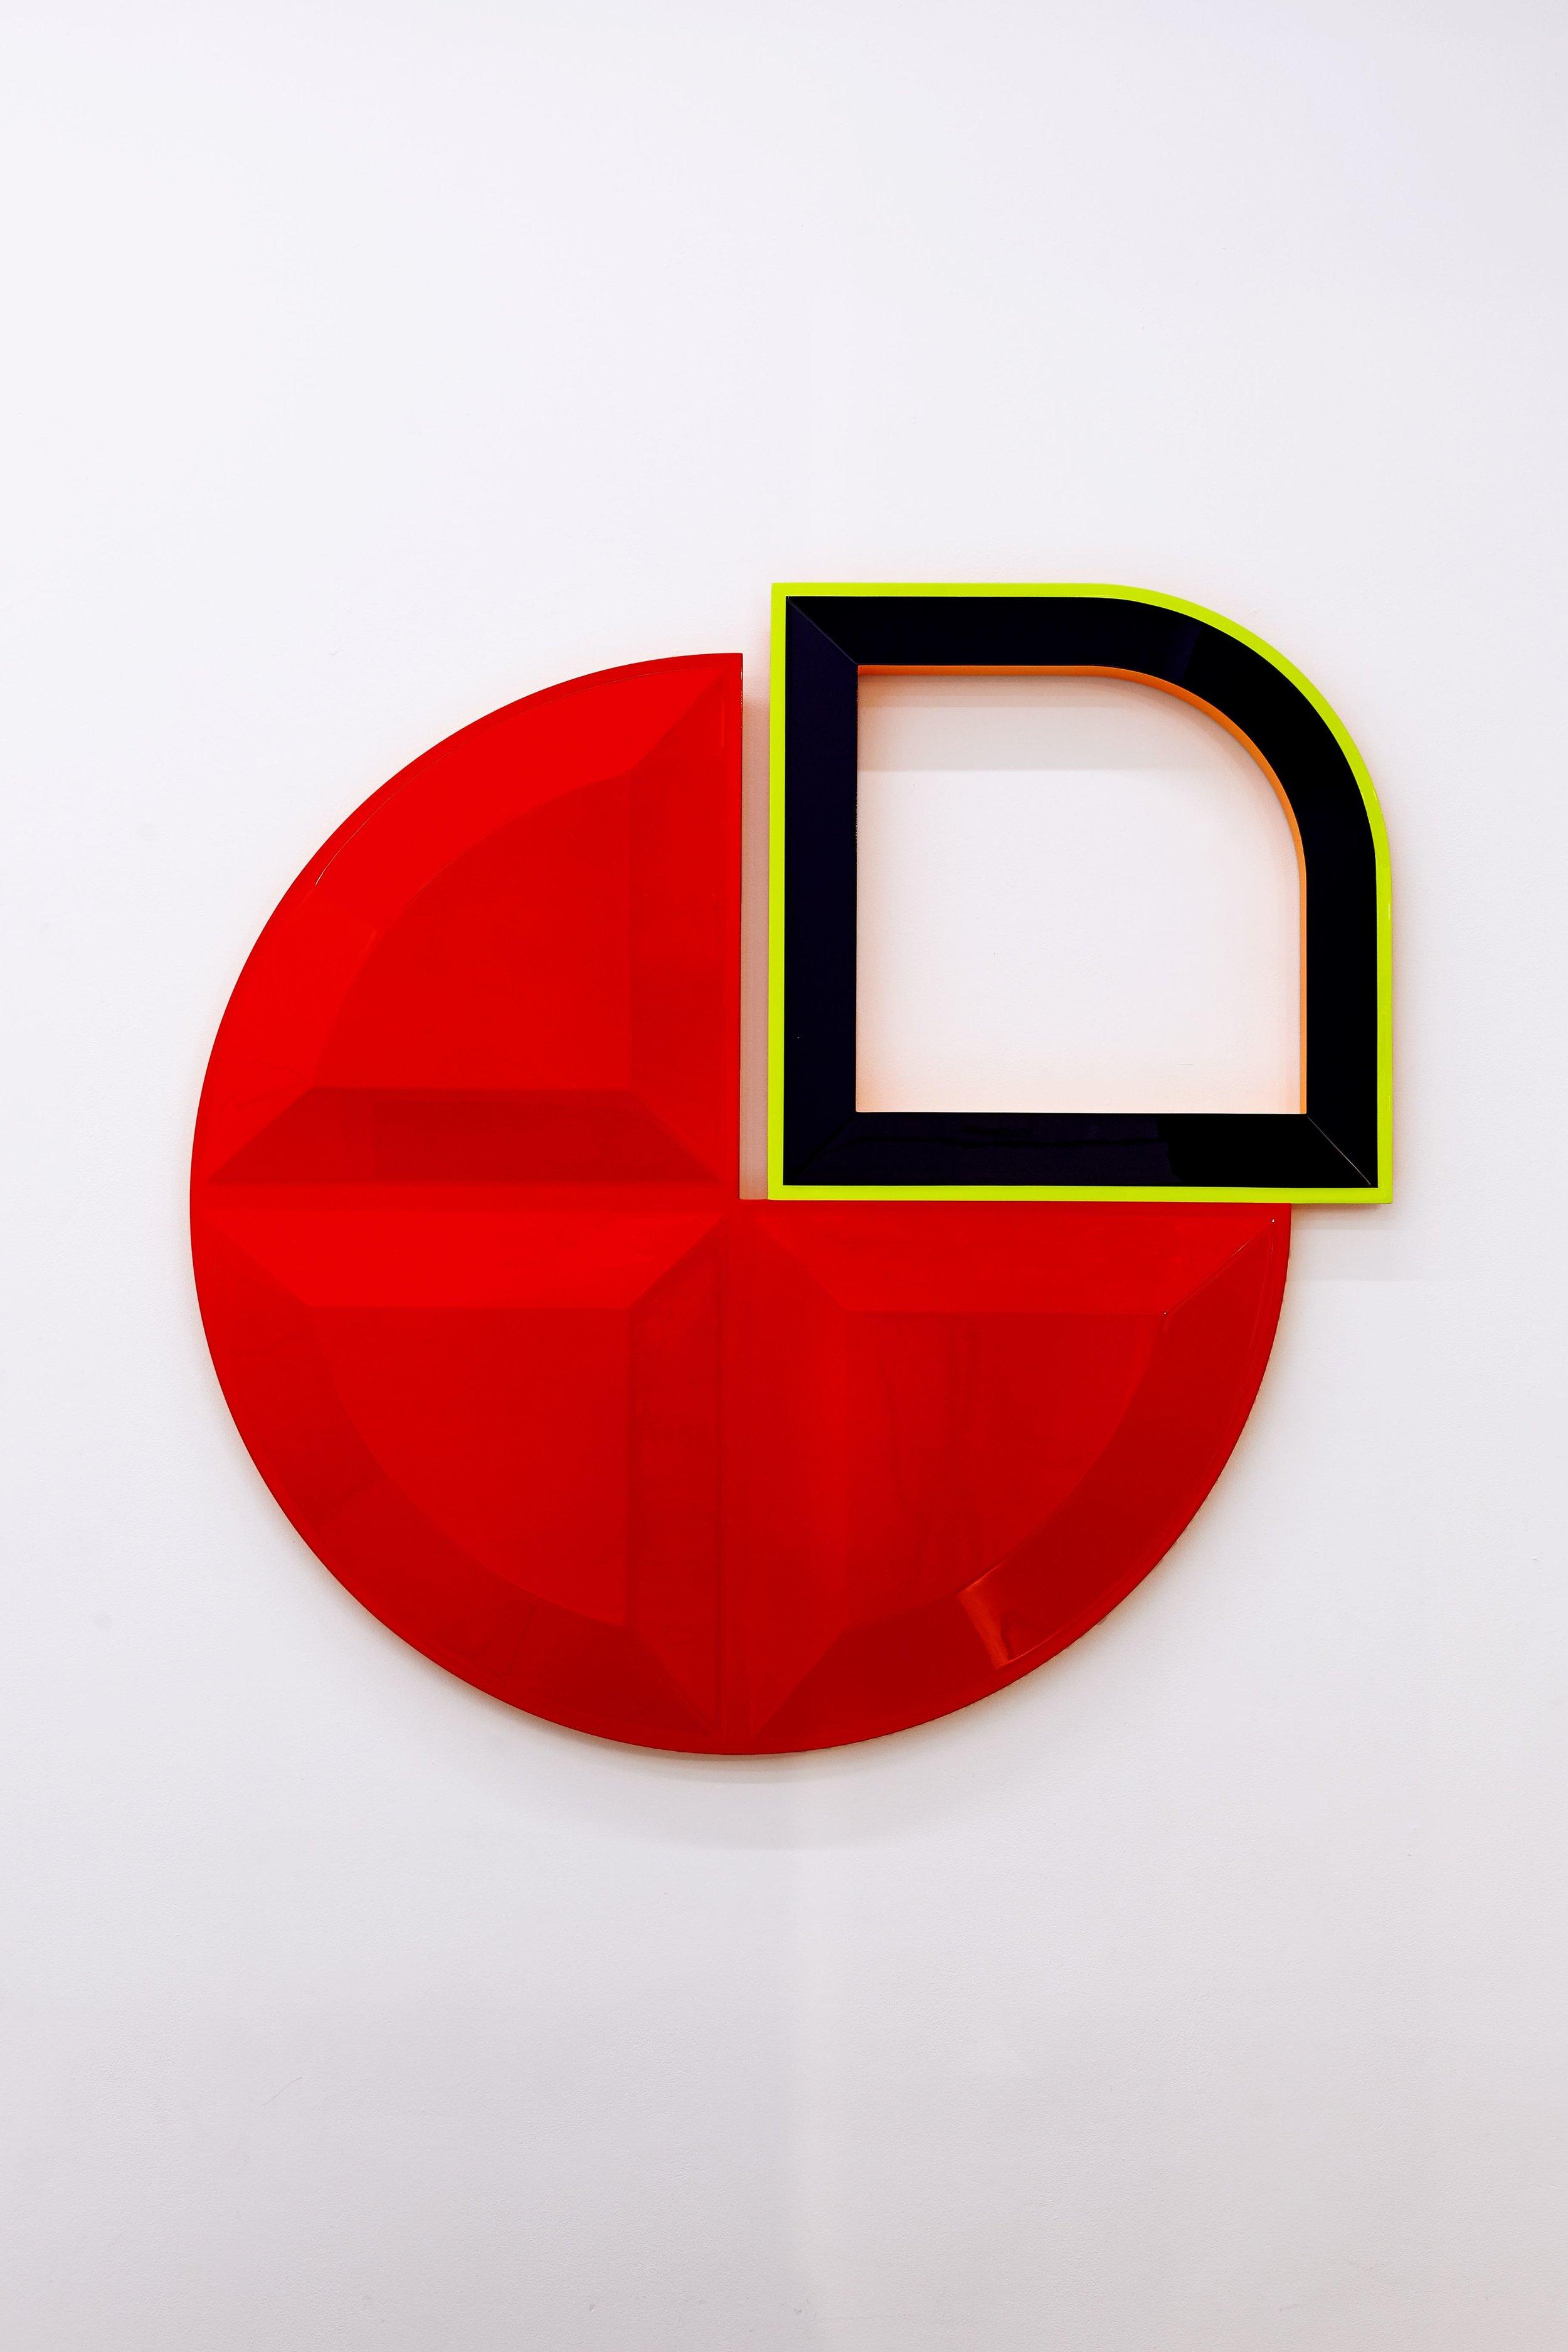 Beverly Fishman, Ronchini Gallery, London, UK